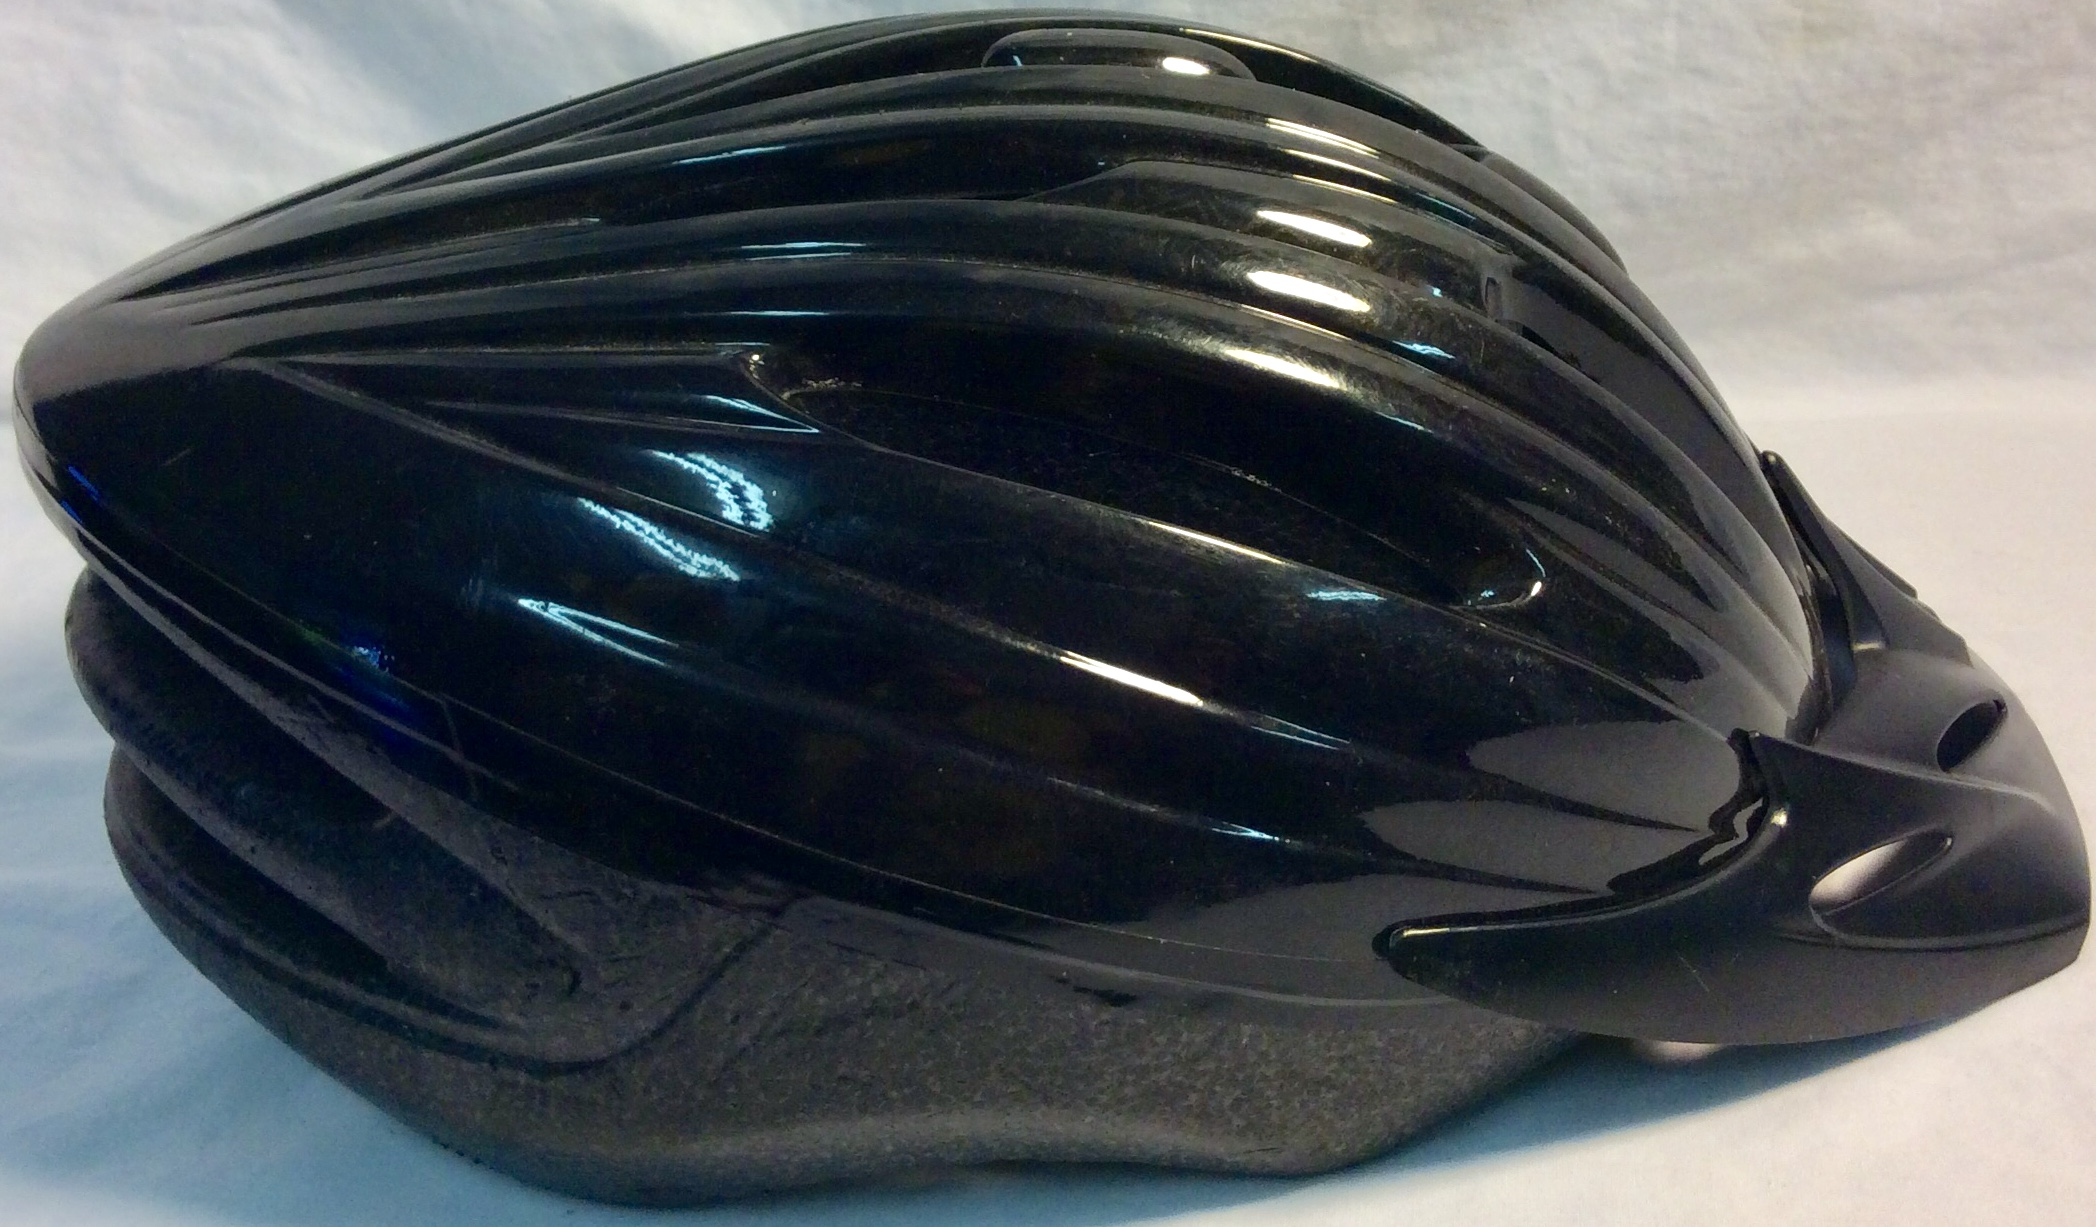 Bike helmet shiny black